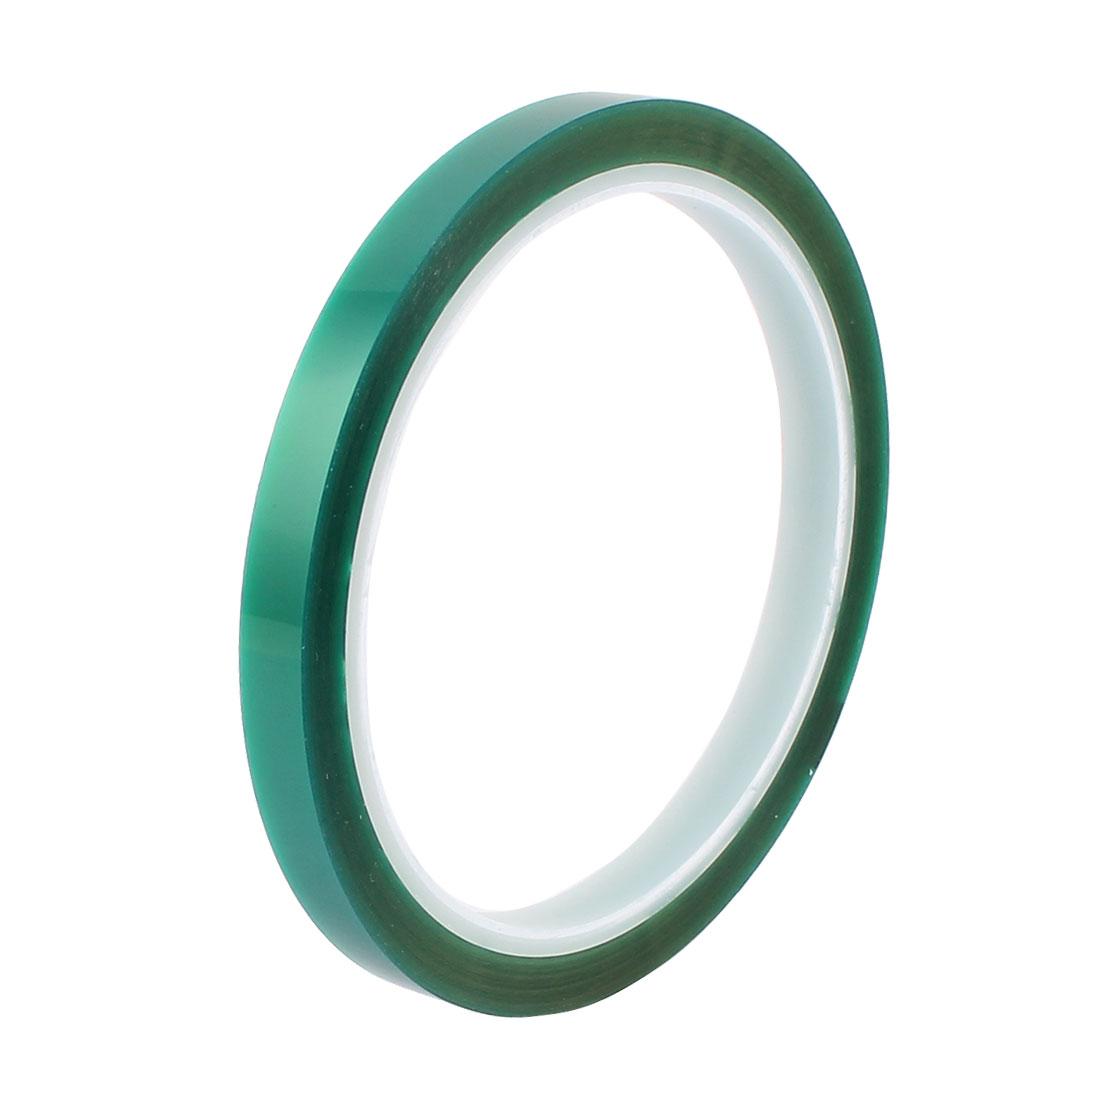 8mm Width 33M Length Green PET High Temperature Heat Resistant PCB Solder Tape